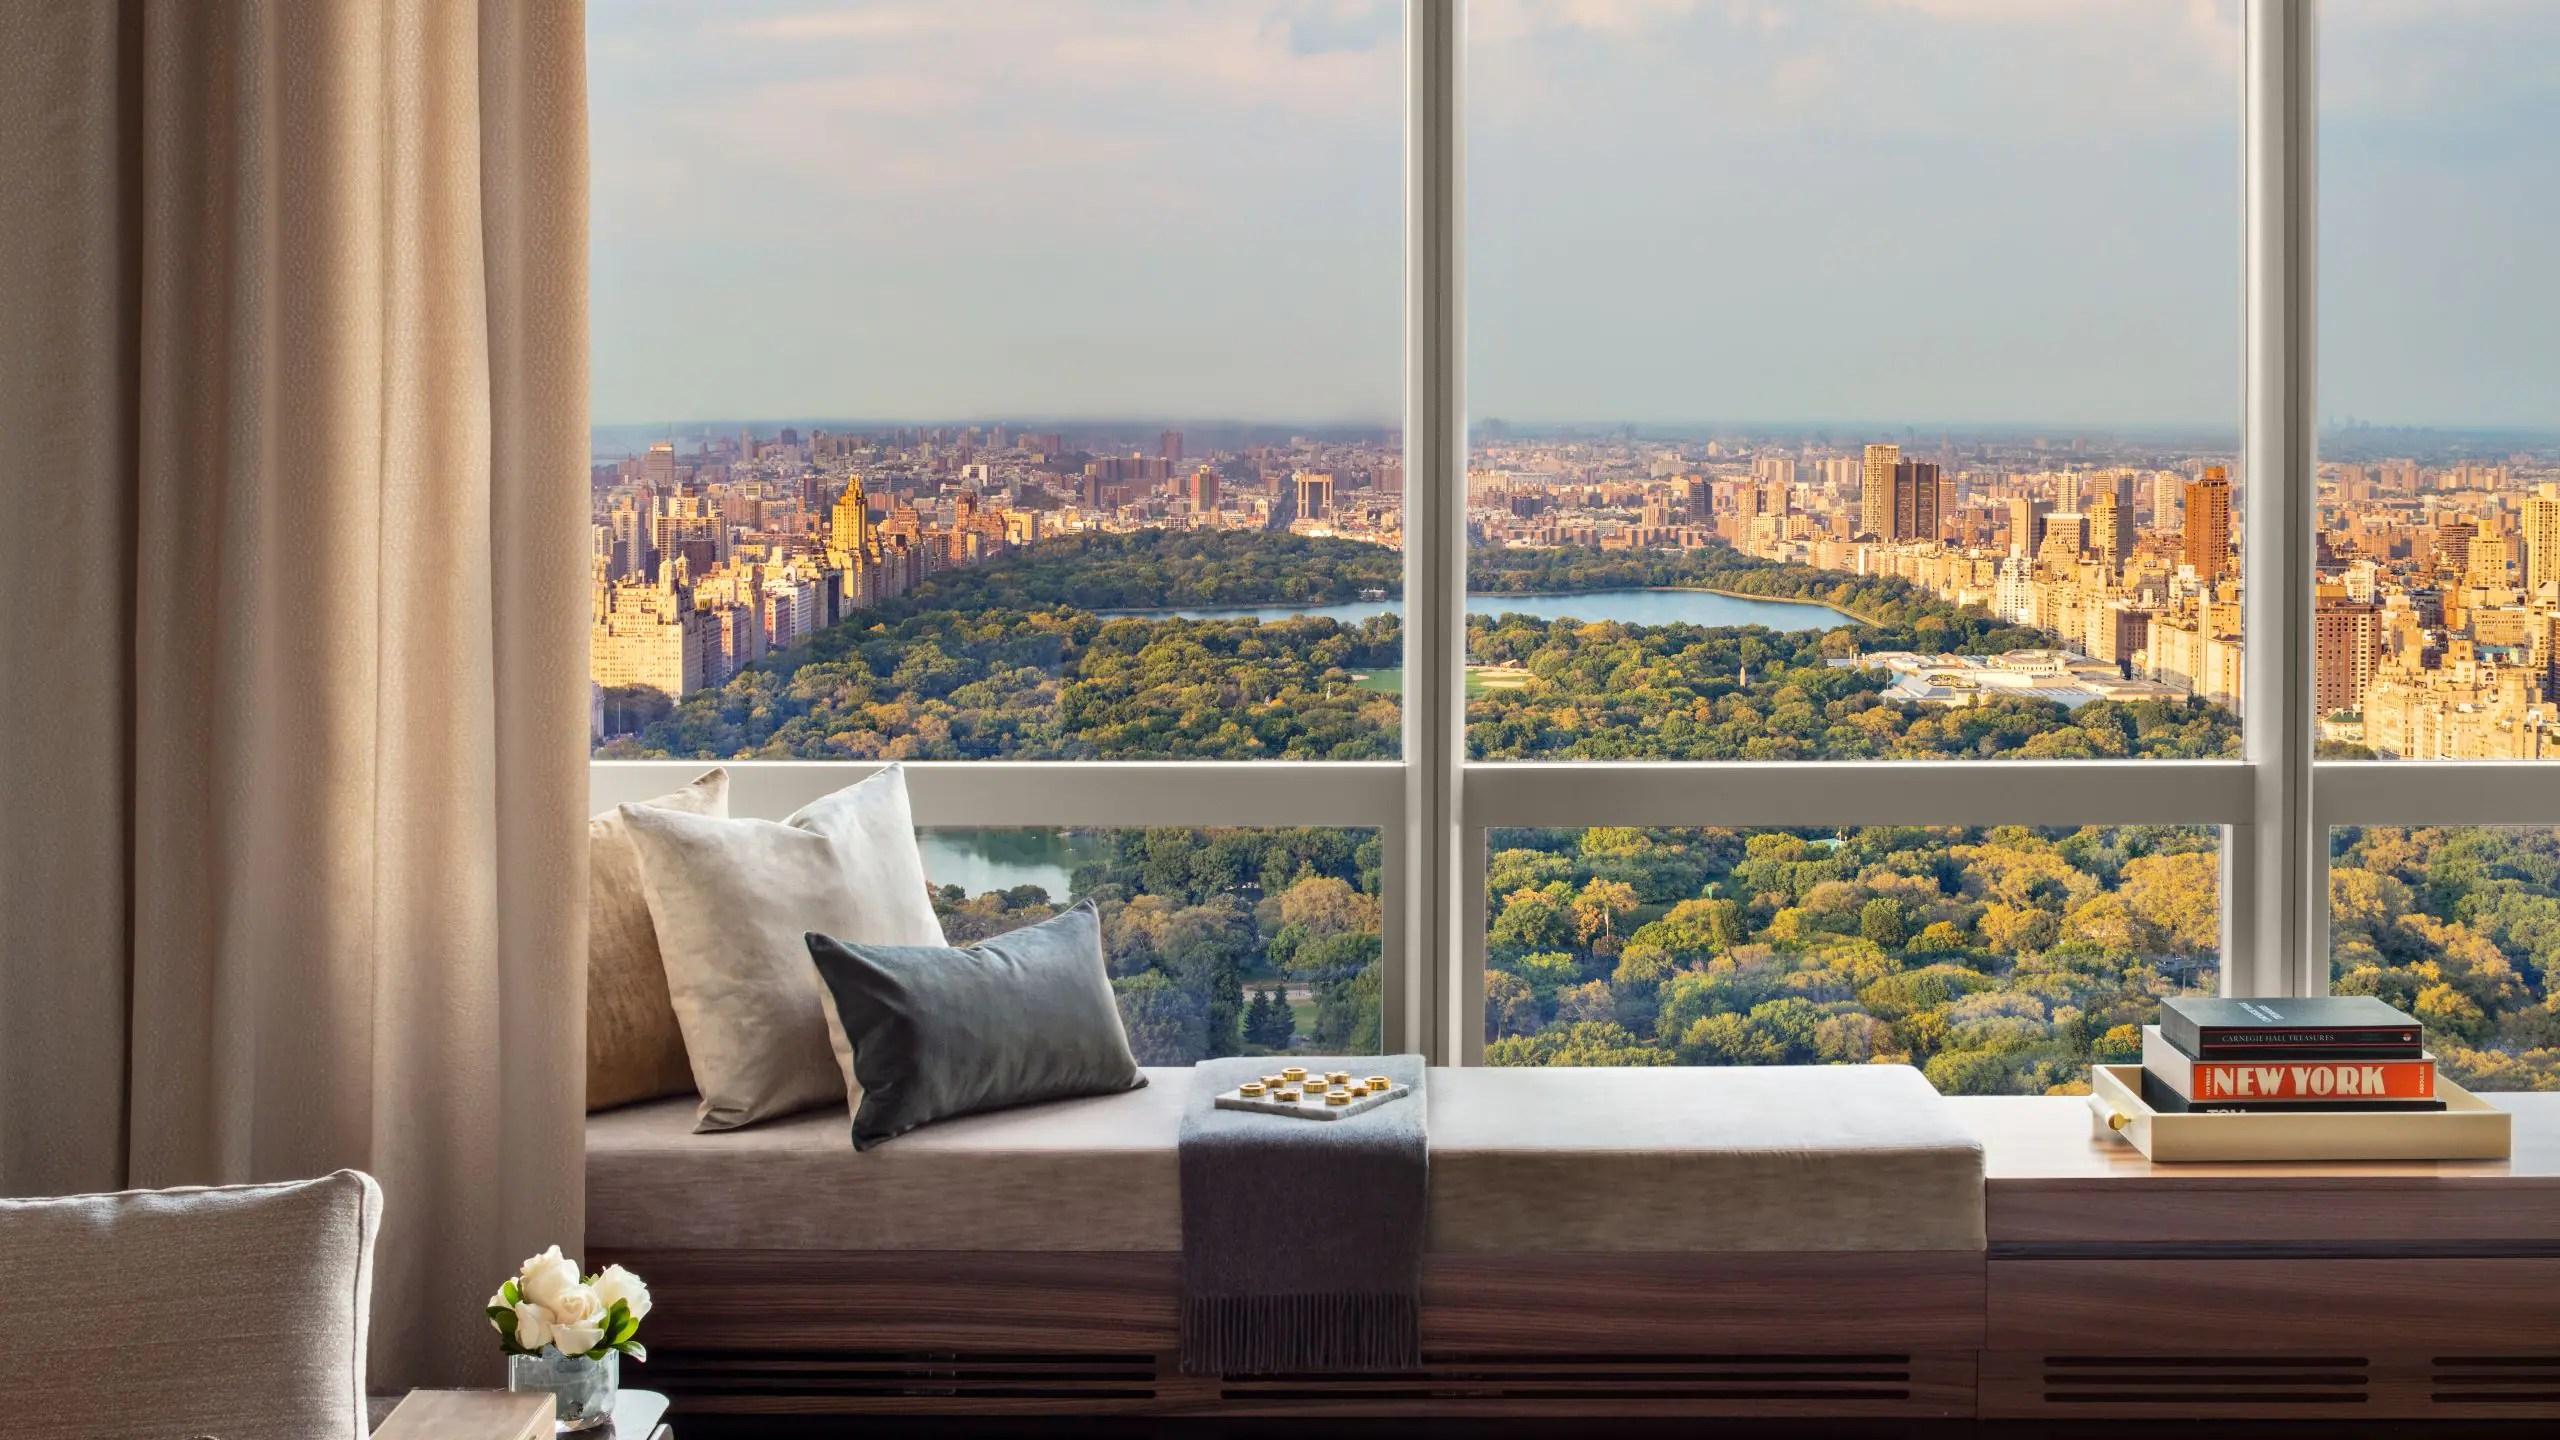 New York City 5 Star Hotel Near Central Park Park Hyatt